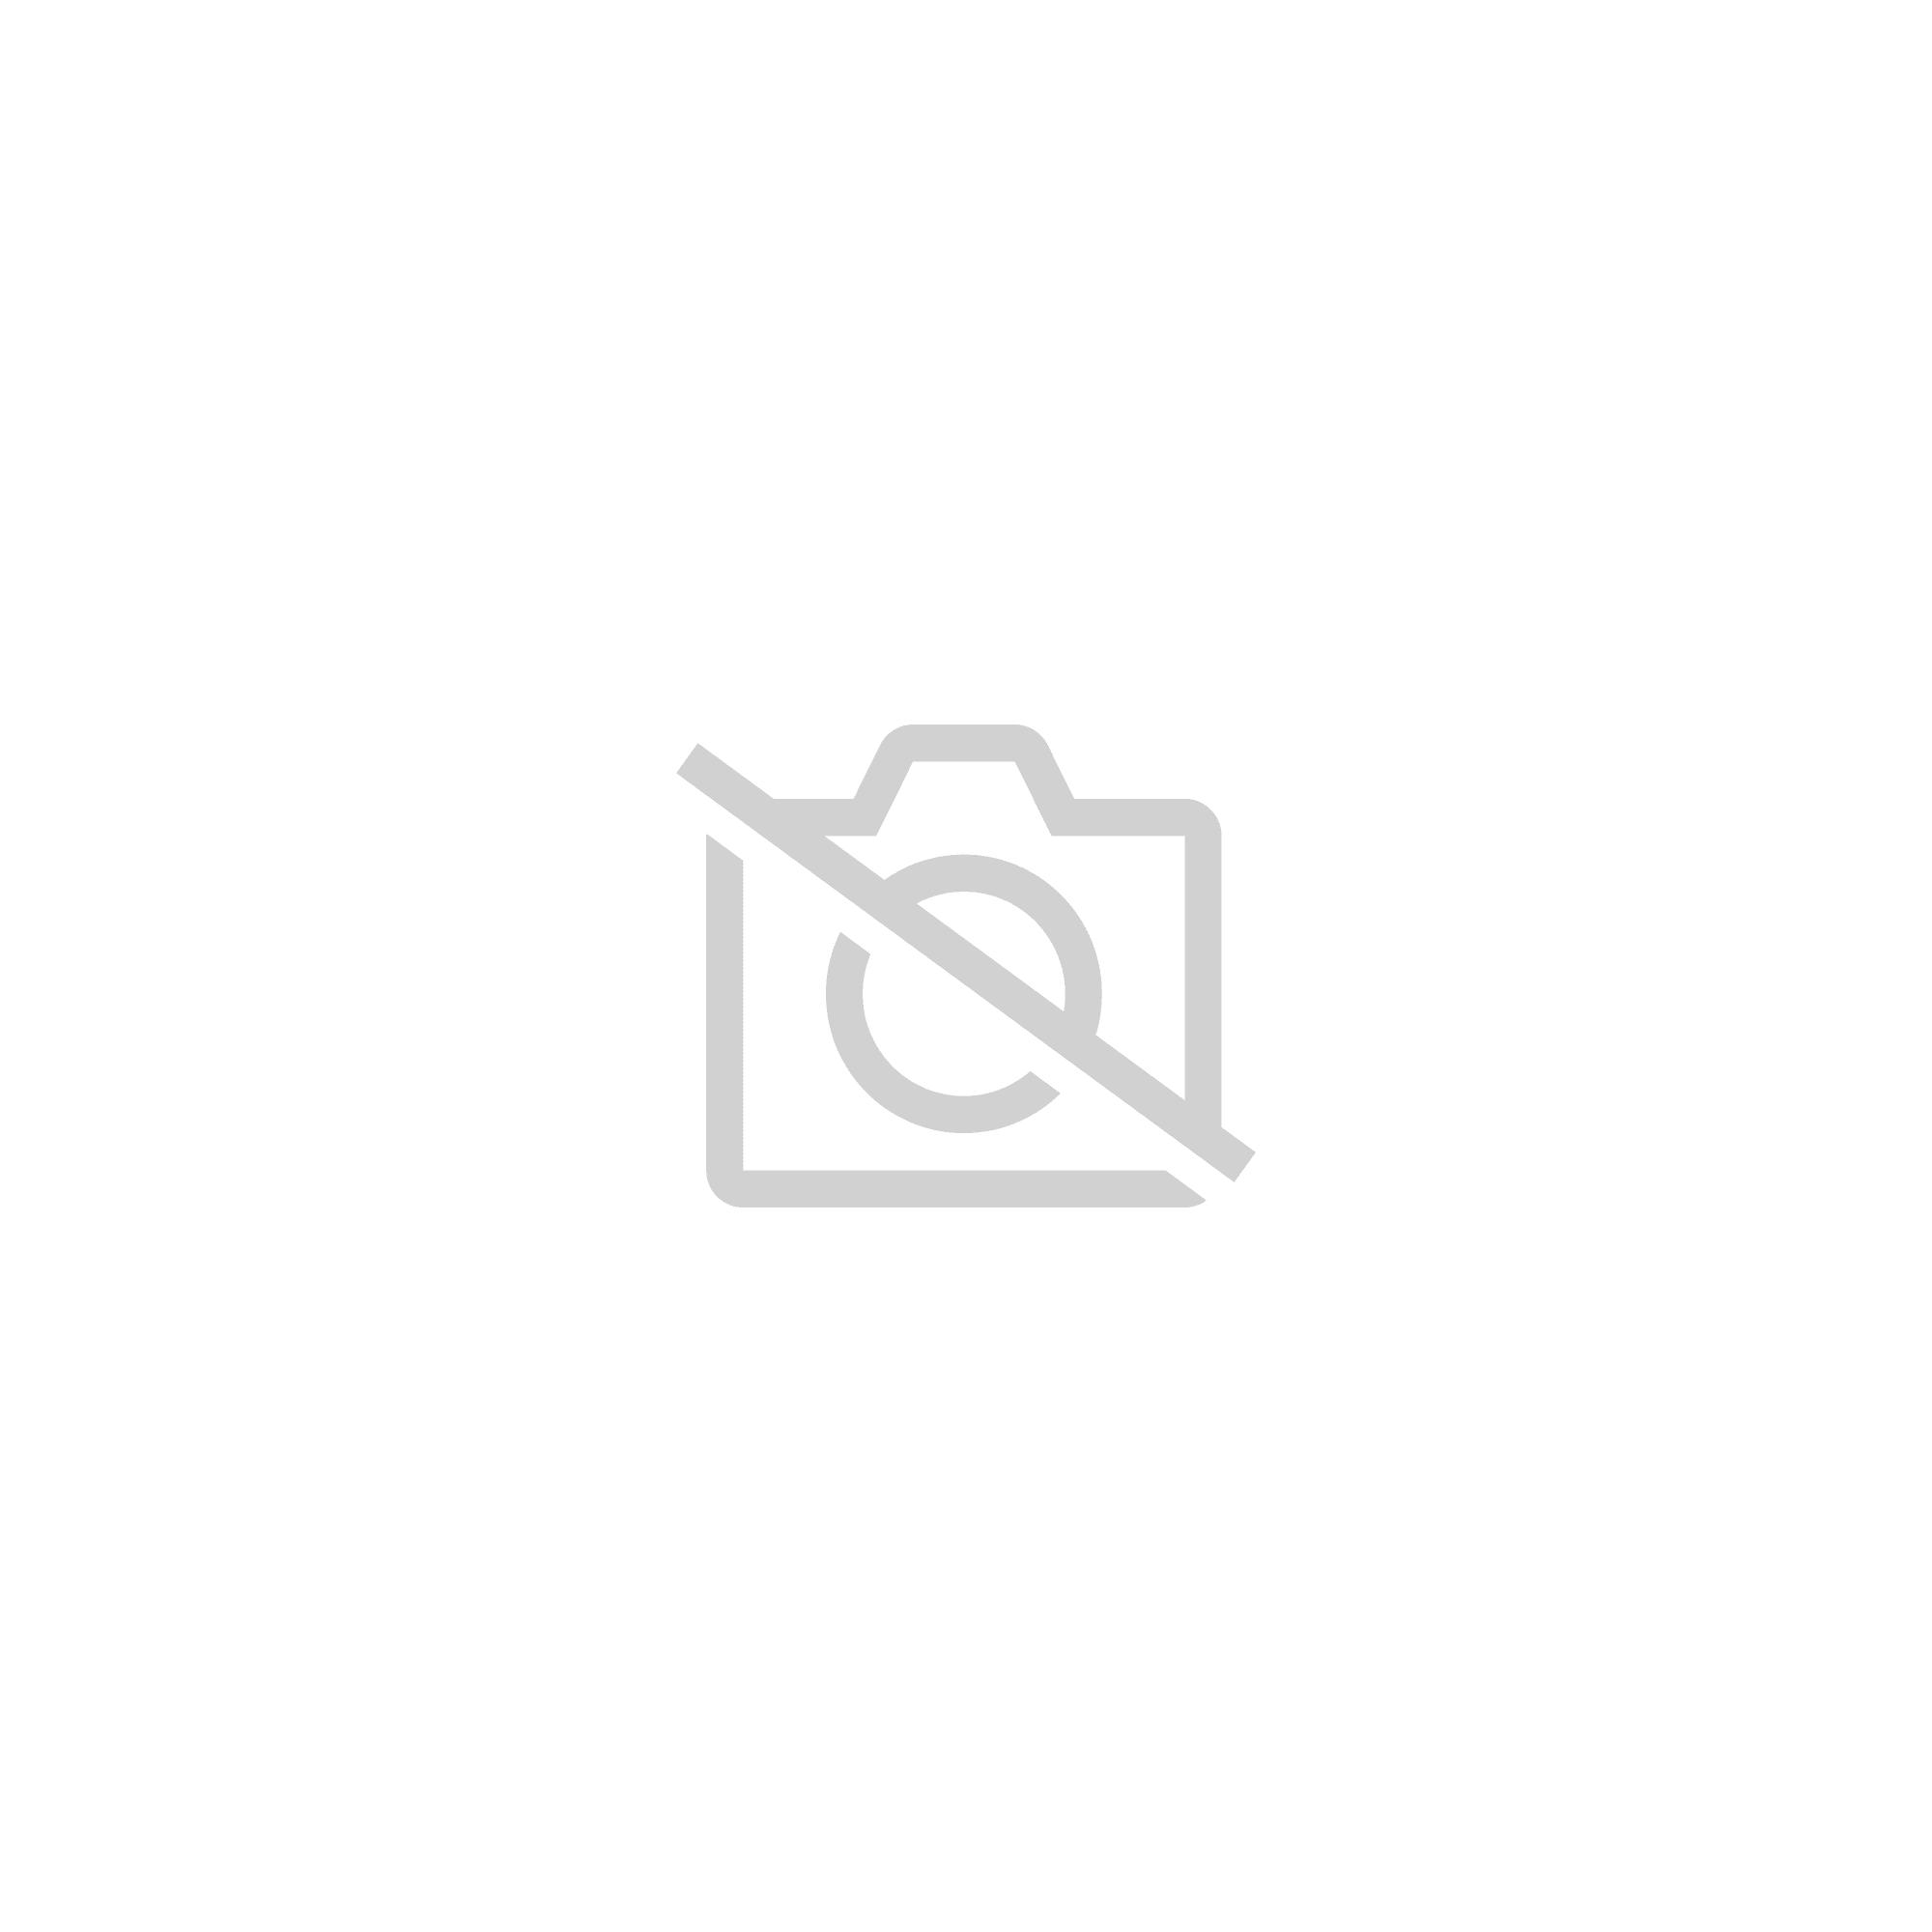 Ontex Id Protection Incontinence Ontex Id Protea Traversable Blanc